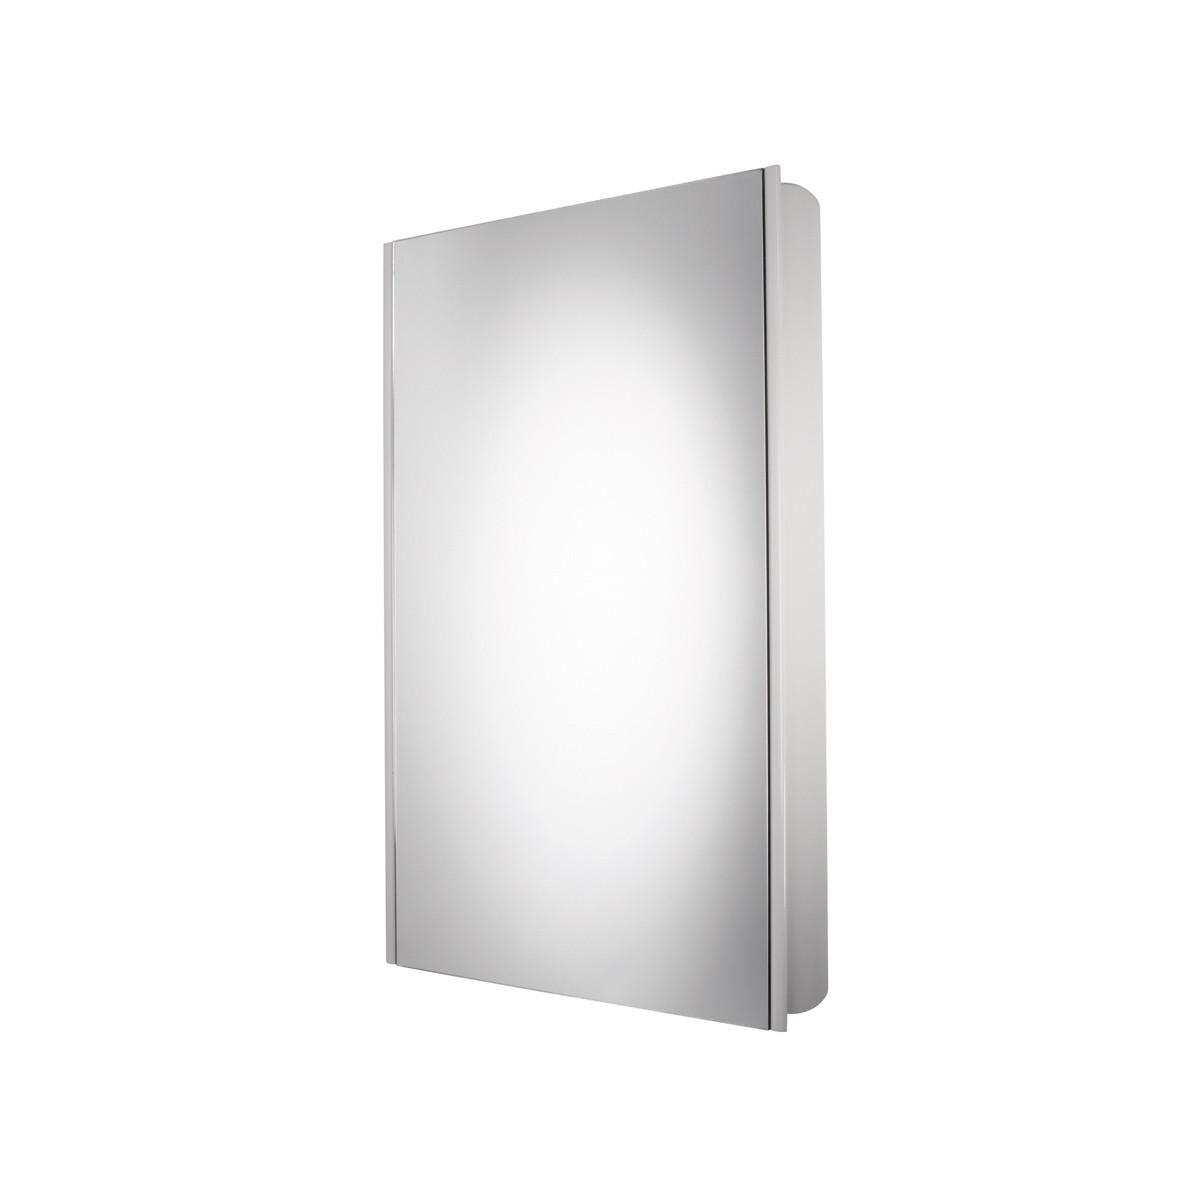 Roper Rhodes Limit Bathroom Cabinet, white finish | AS415W